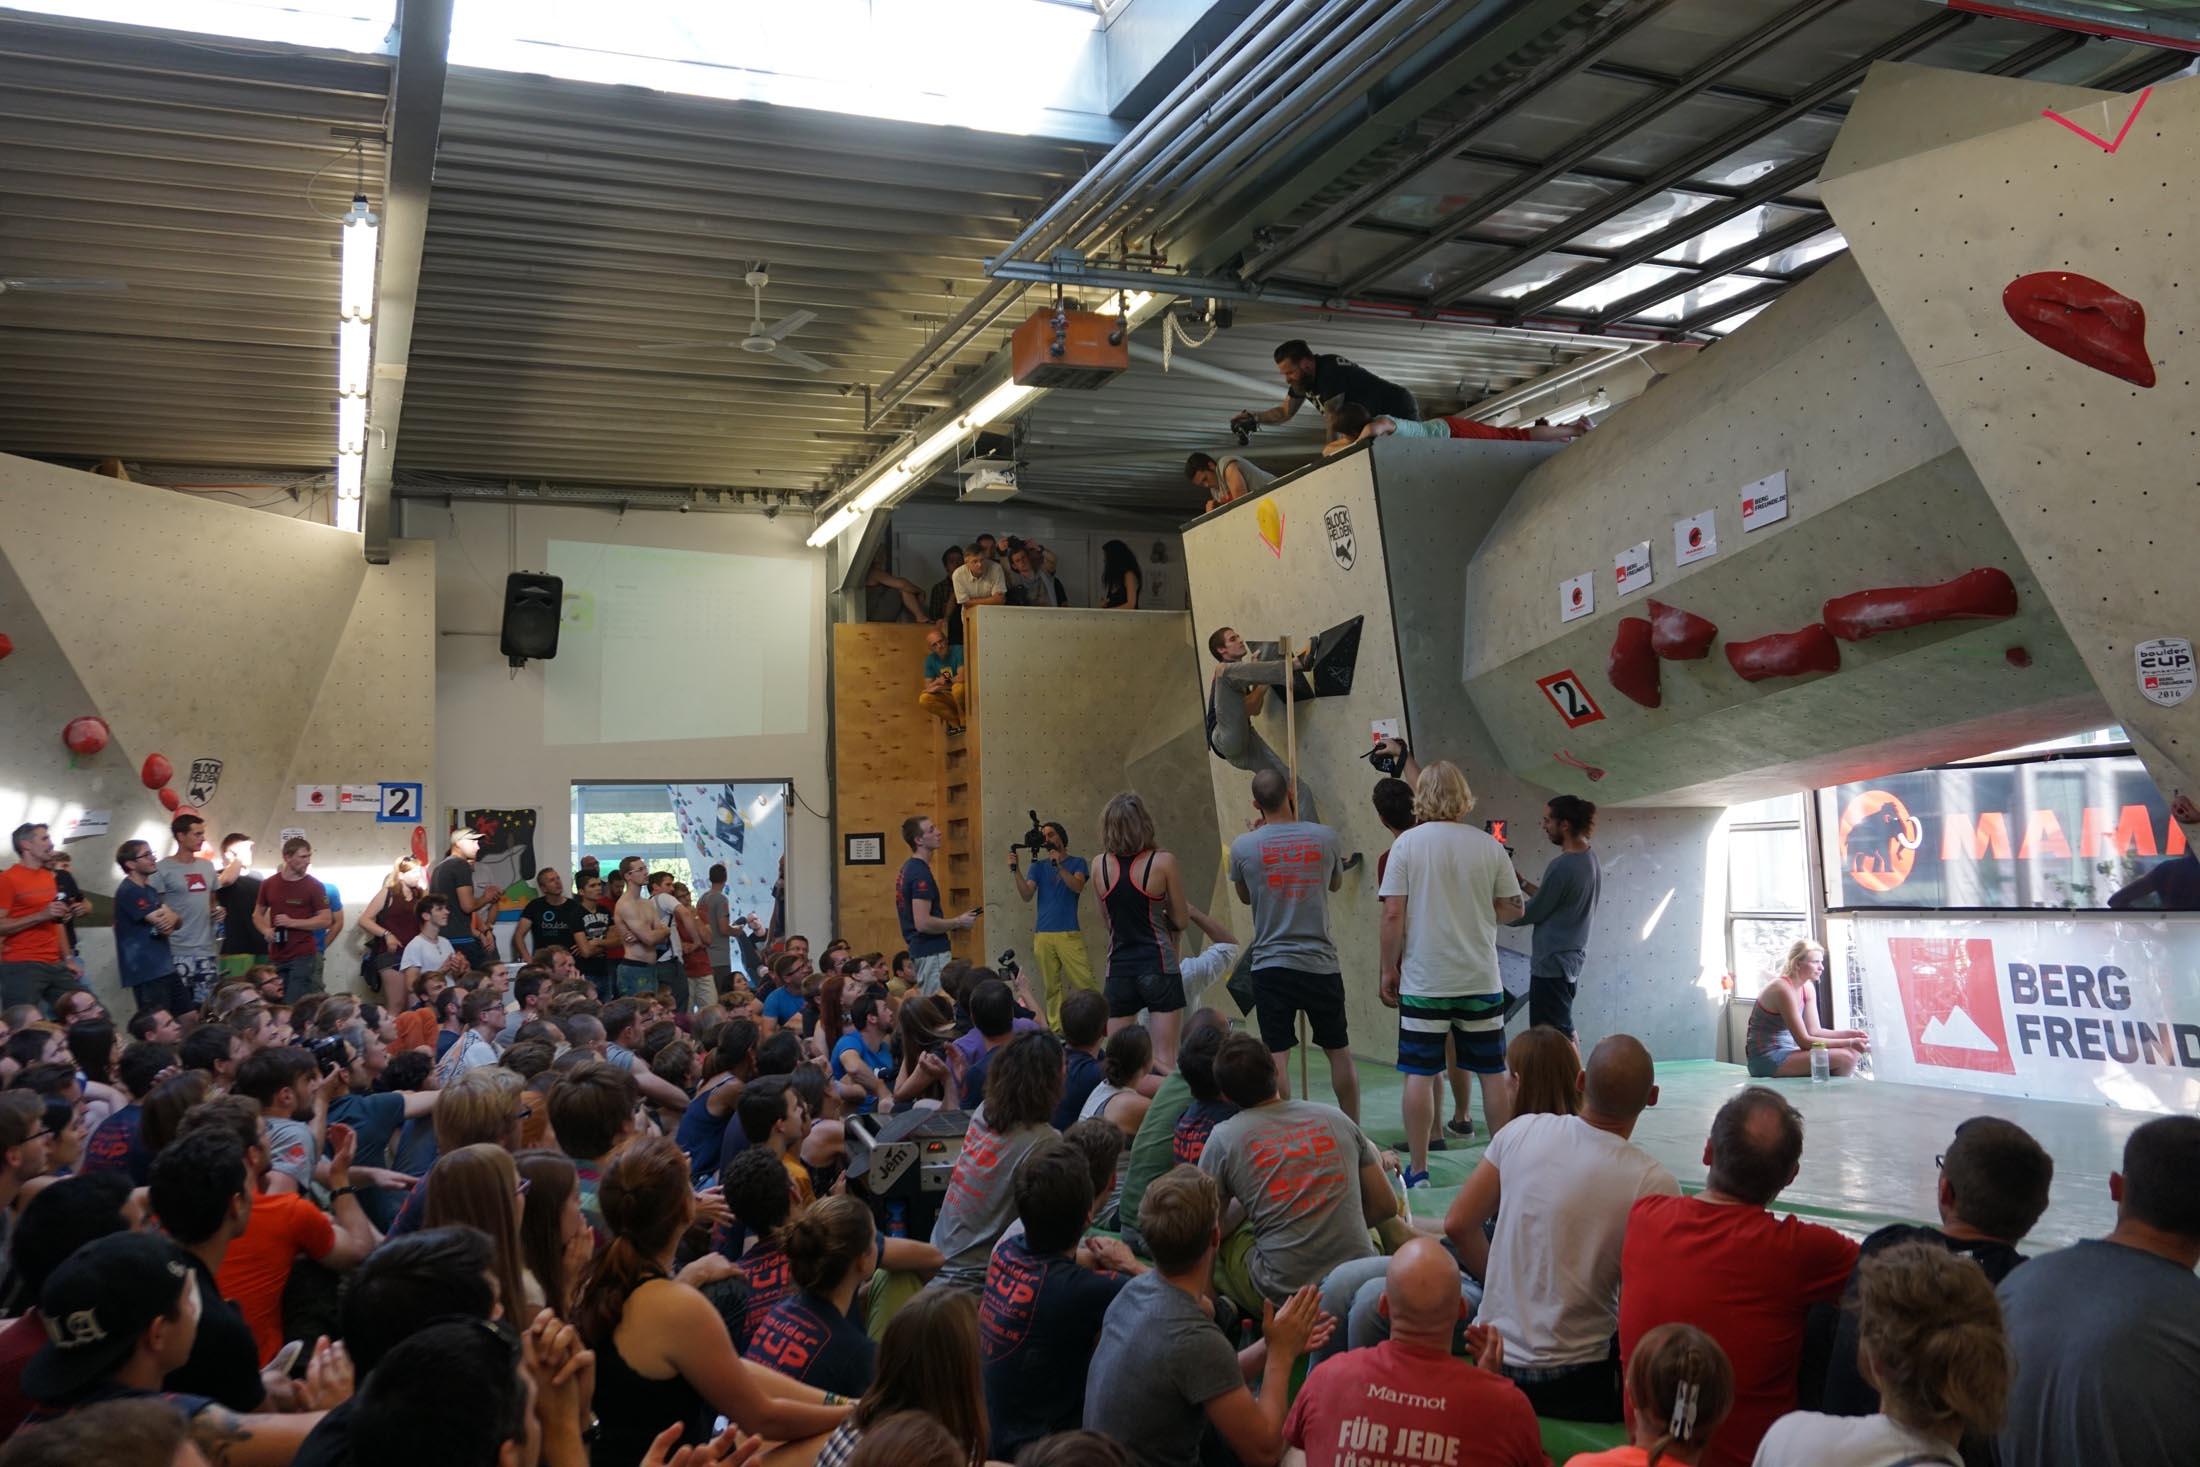 Finale, internationaler bouldercup Frankenjura 2016, BLOCKHELDEN Erlangen, Mammut, Bergfreunde.de, Boulderwettkampf07092016535